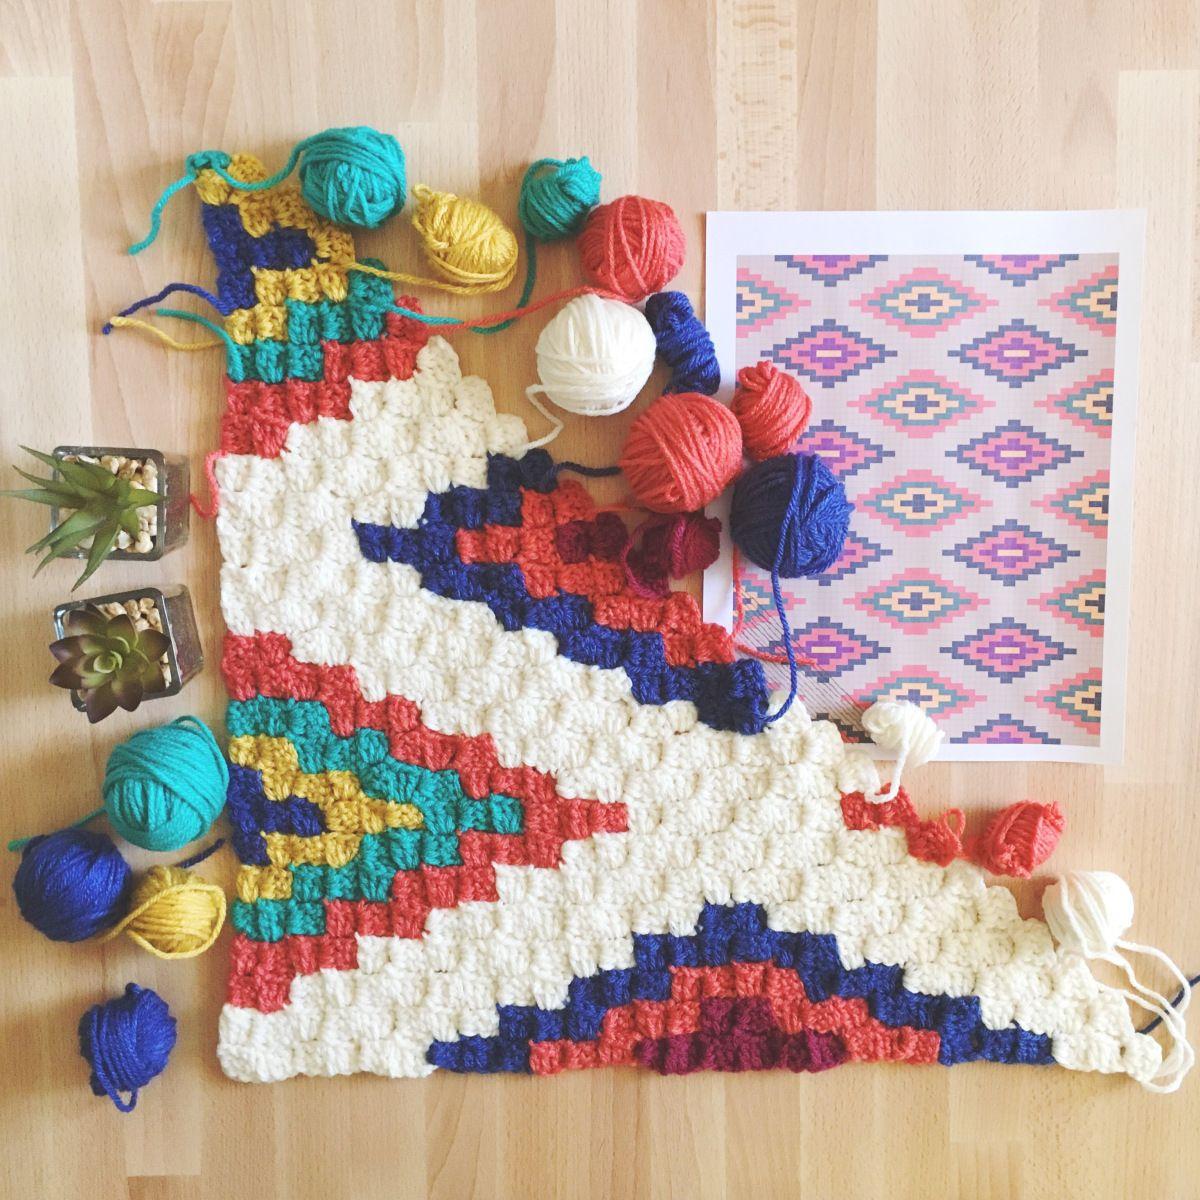 Southwestern Style Crochet Throw | Häckeln, c2c Häkeln und gehäkelte ...